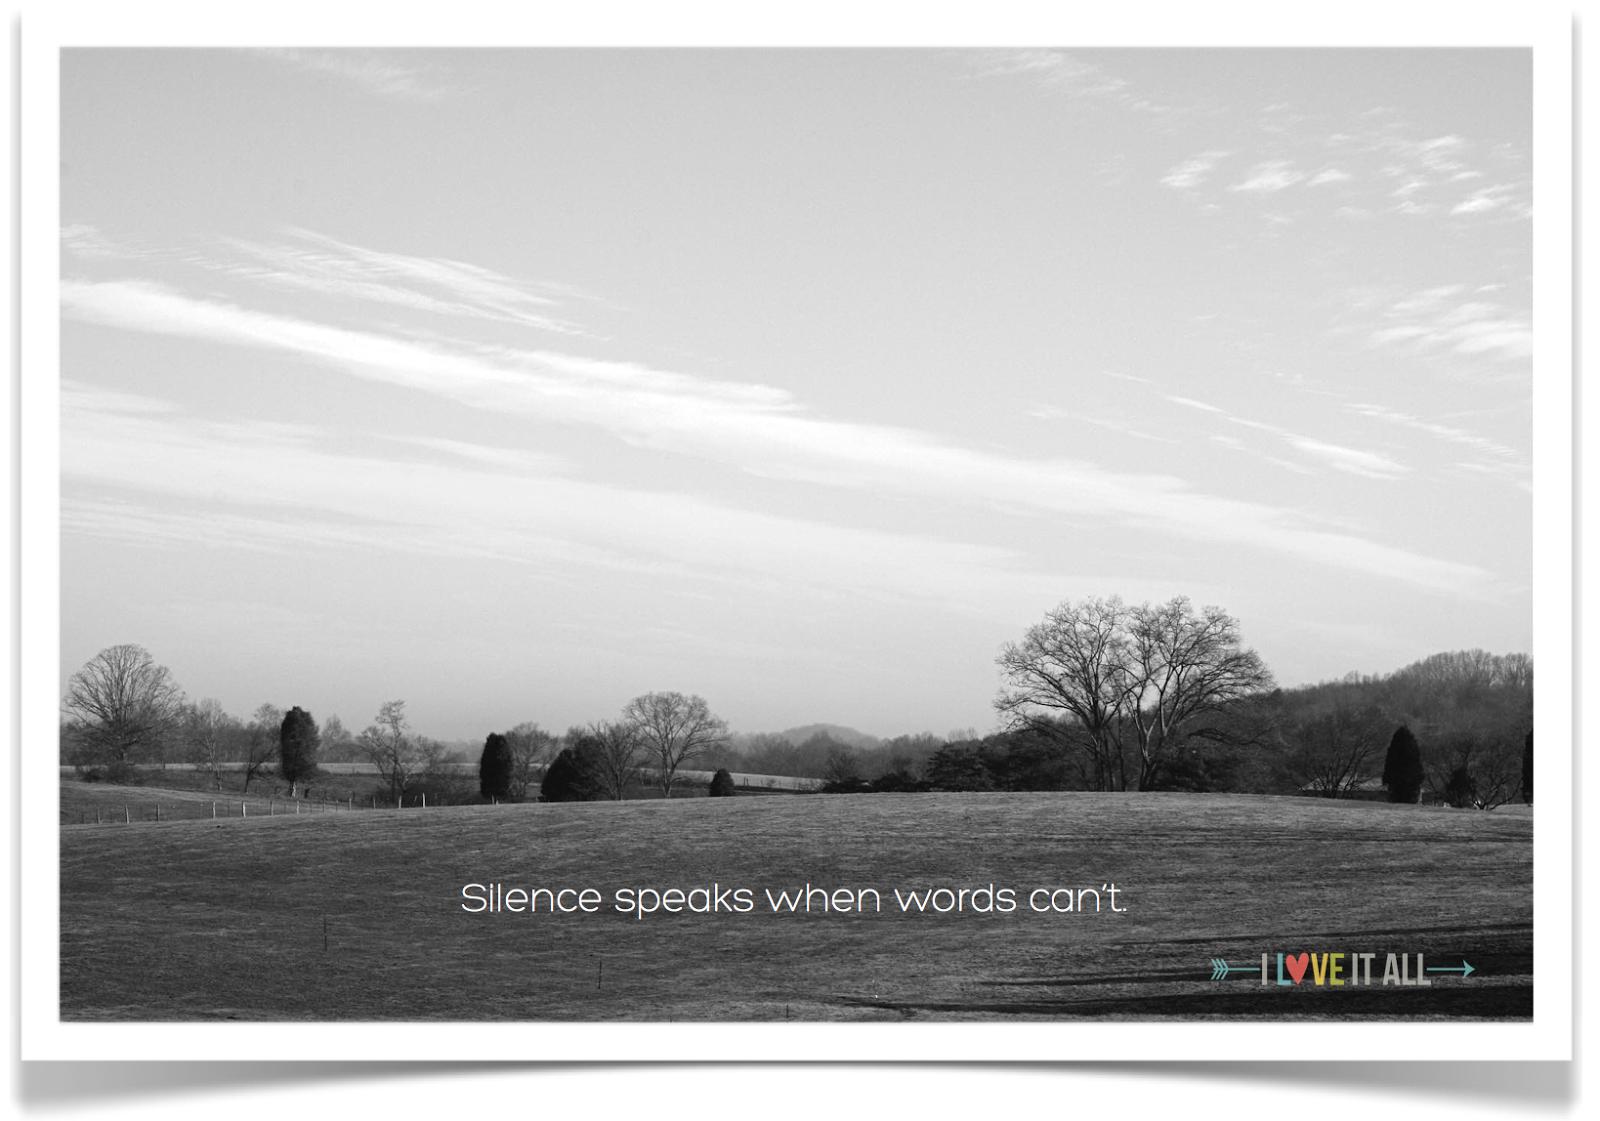 #silence #quote #mountains #blackandwhite #trees #sky